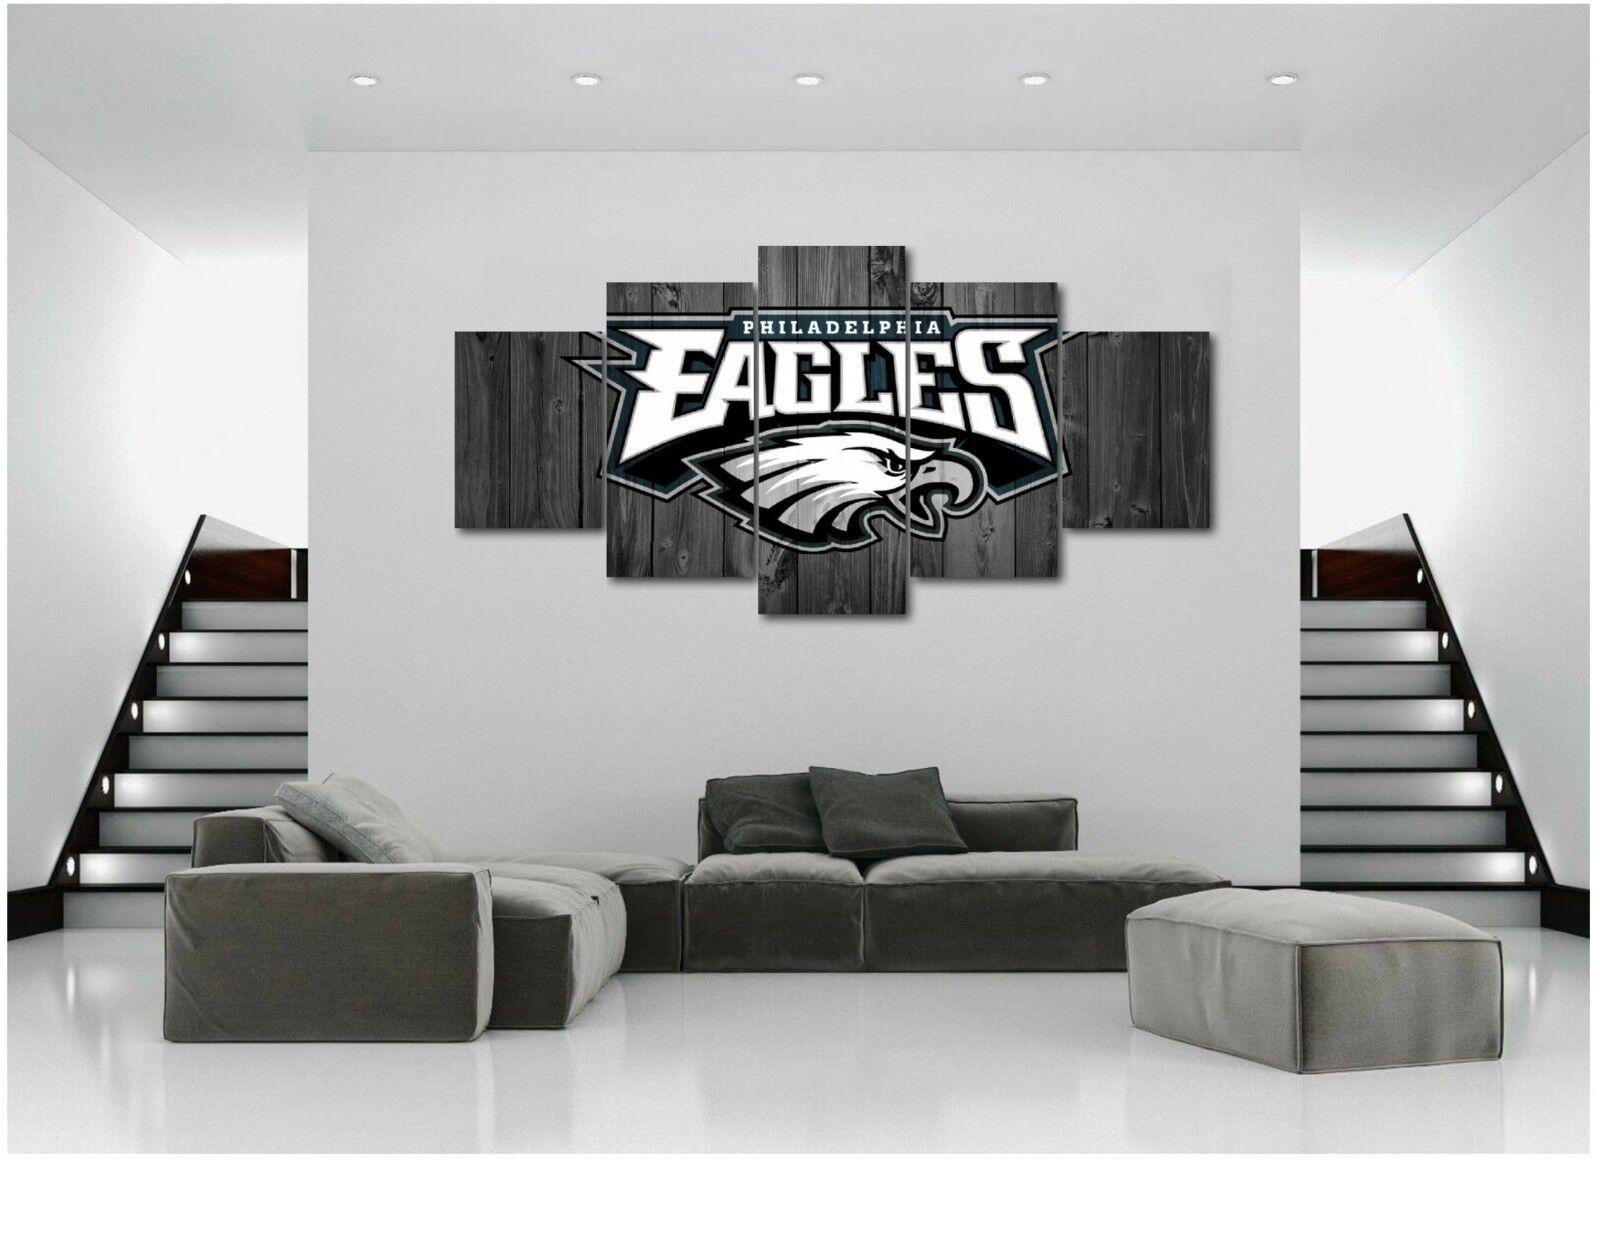 Large Five Piece Philadelphia Eagles Football Barn Drucken Home Decor Wood Look